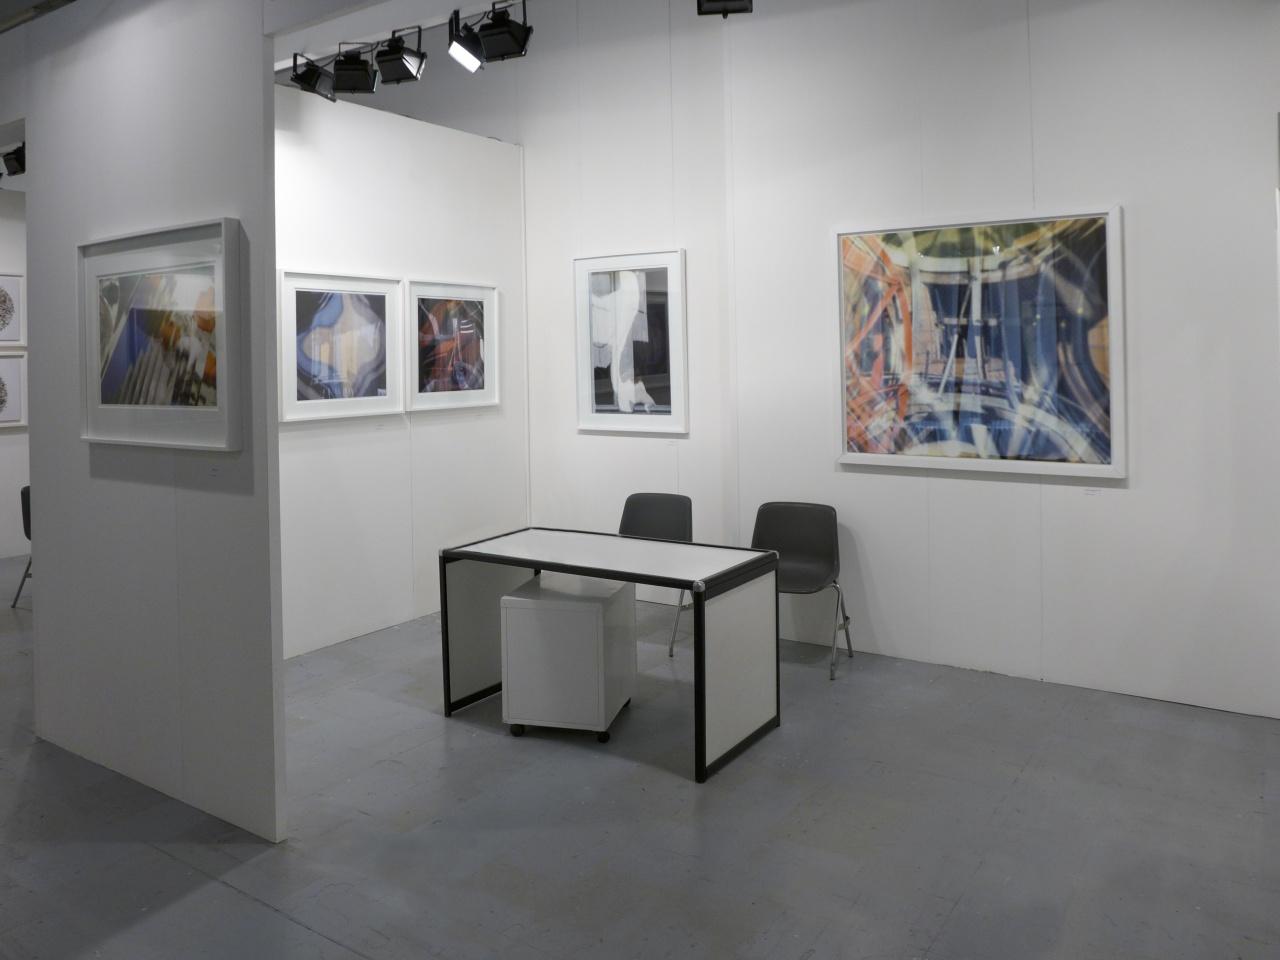 2013 - MIA Milan Image Art Fair